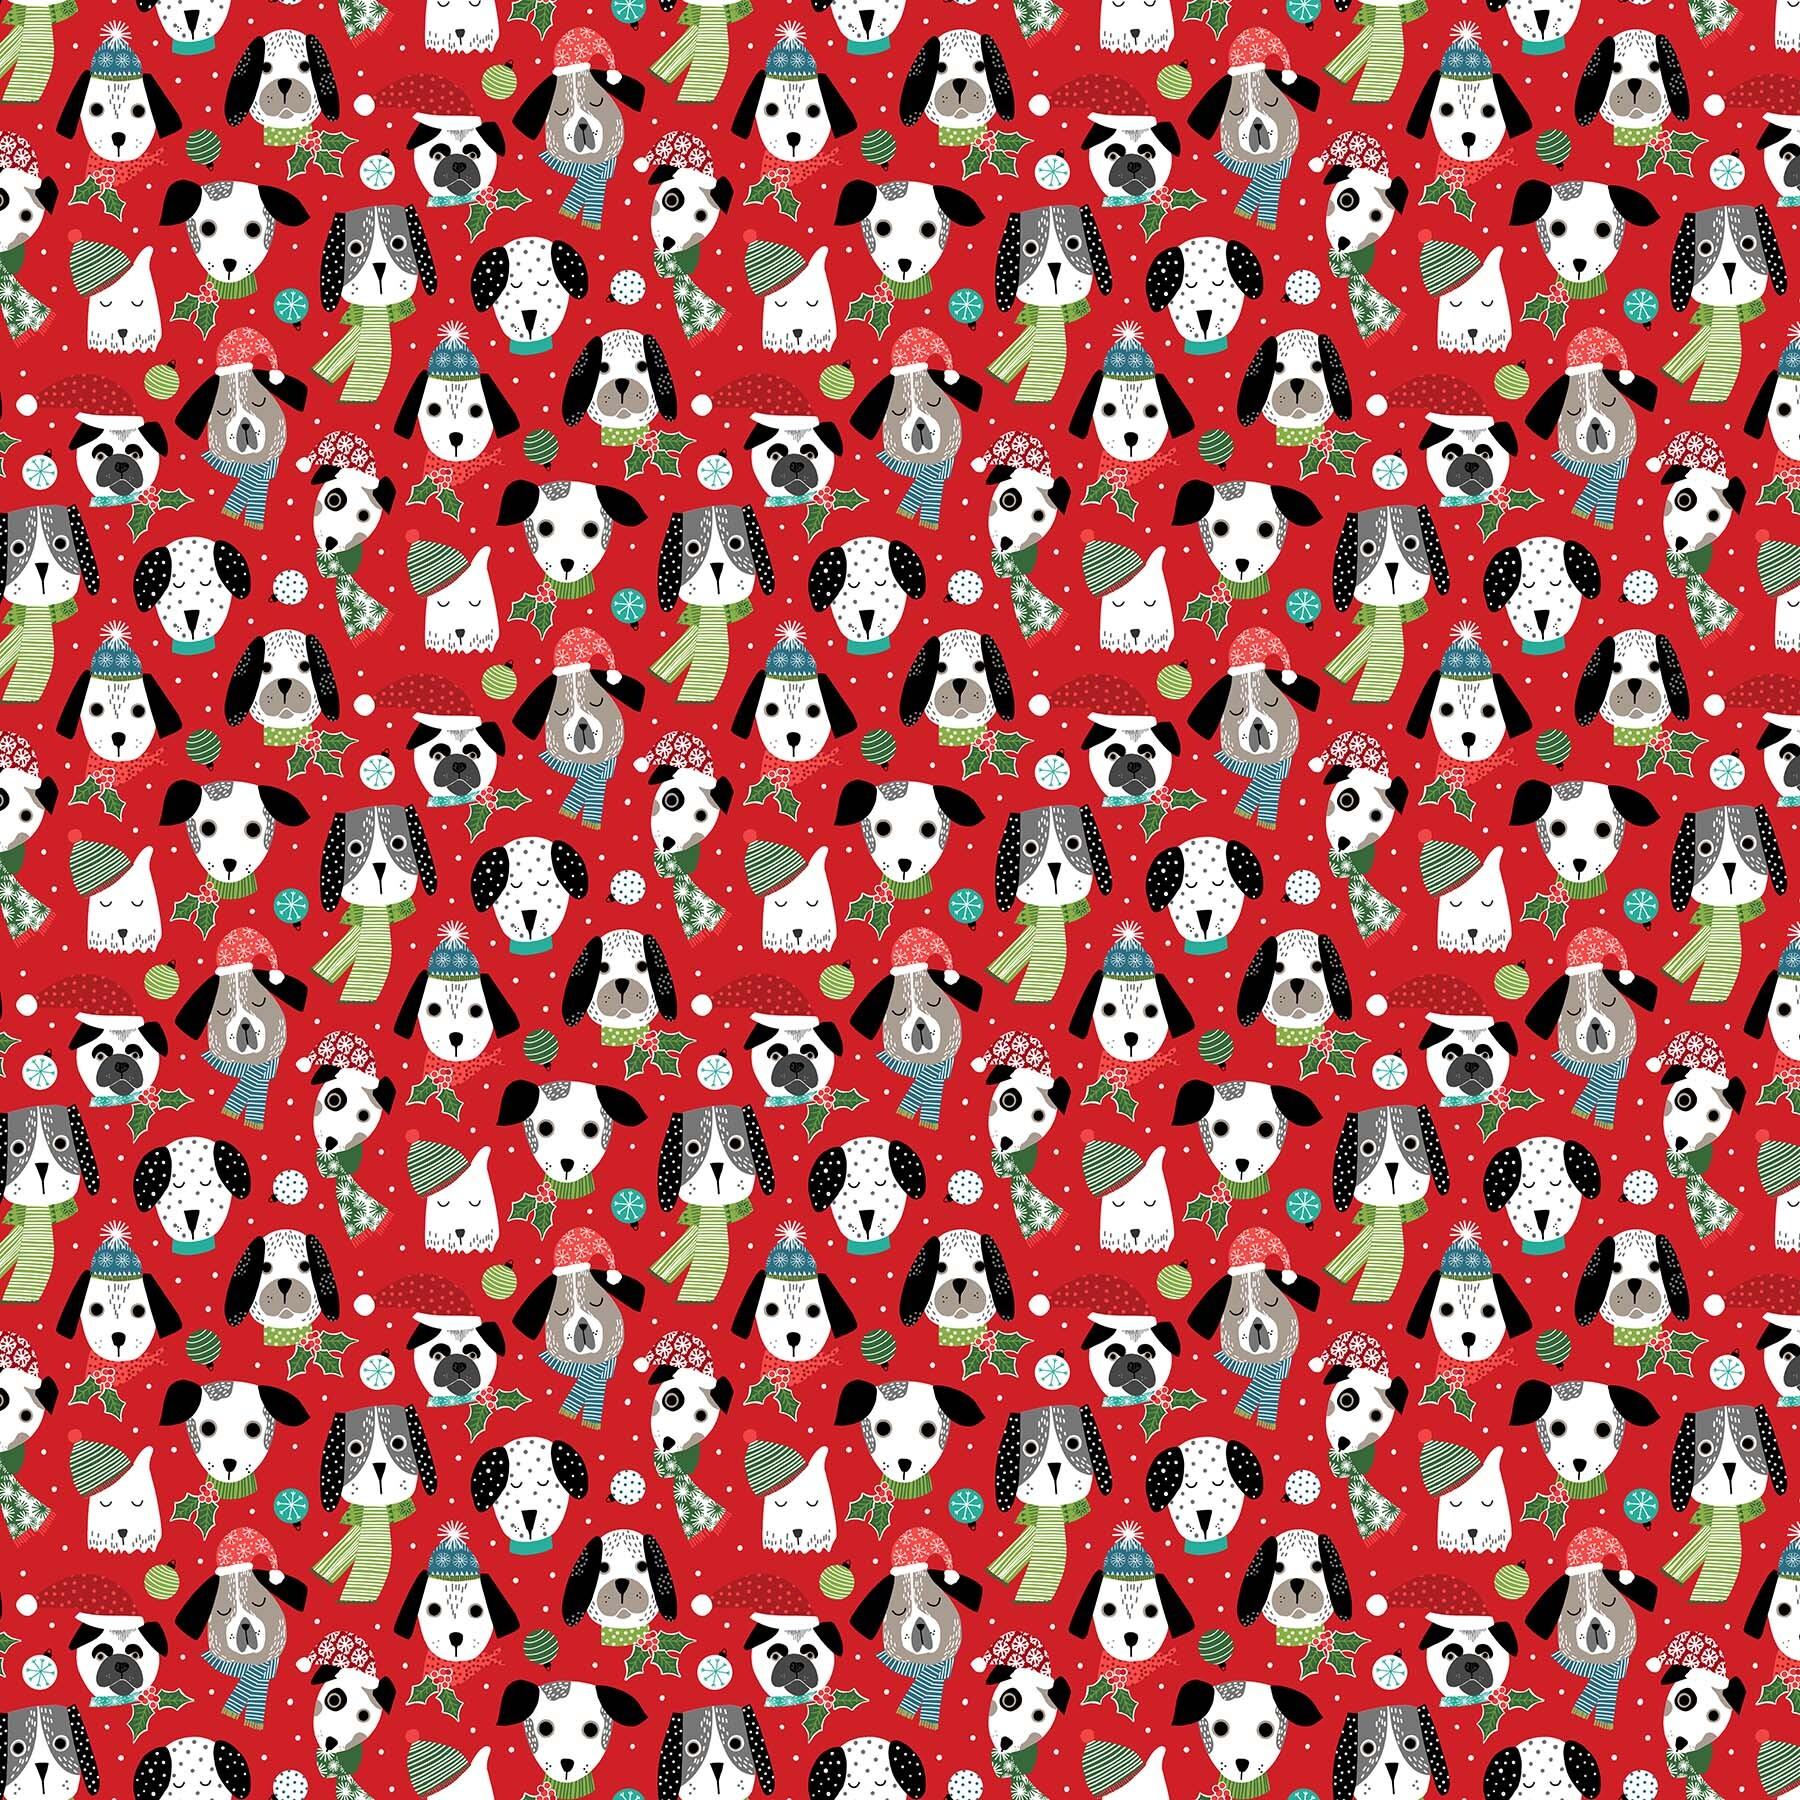 Santa Paws - Red Dog Faces - 1/2m cut 58024